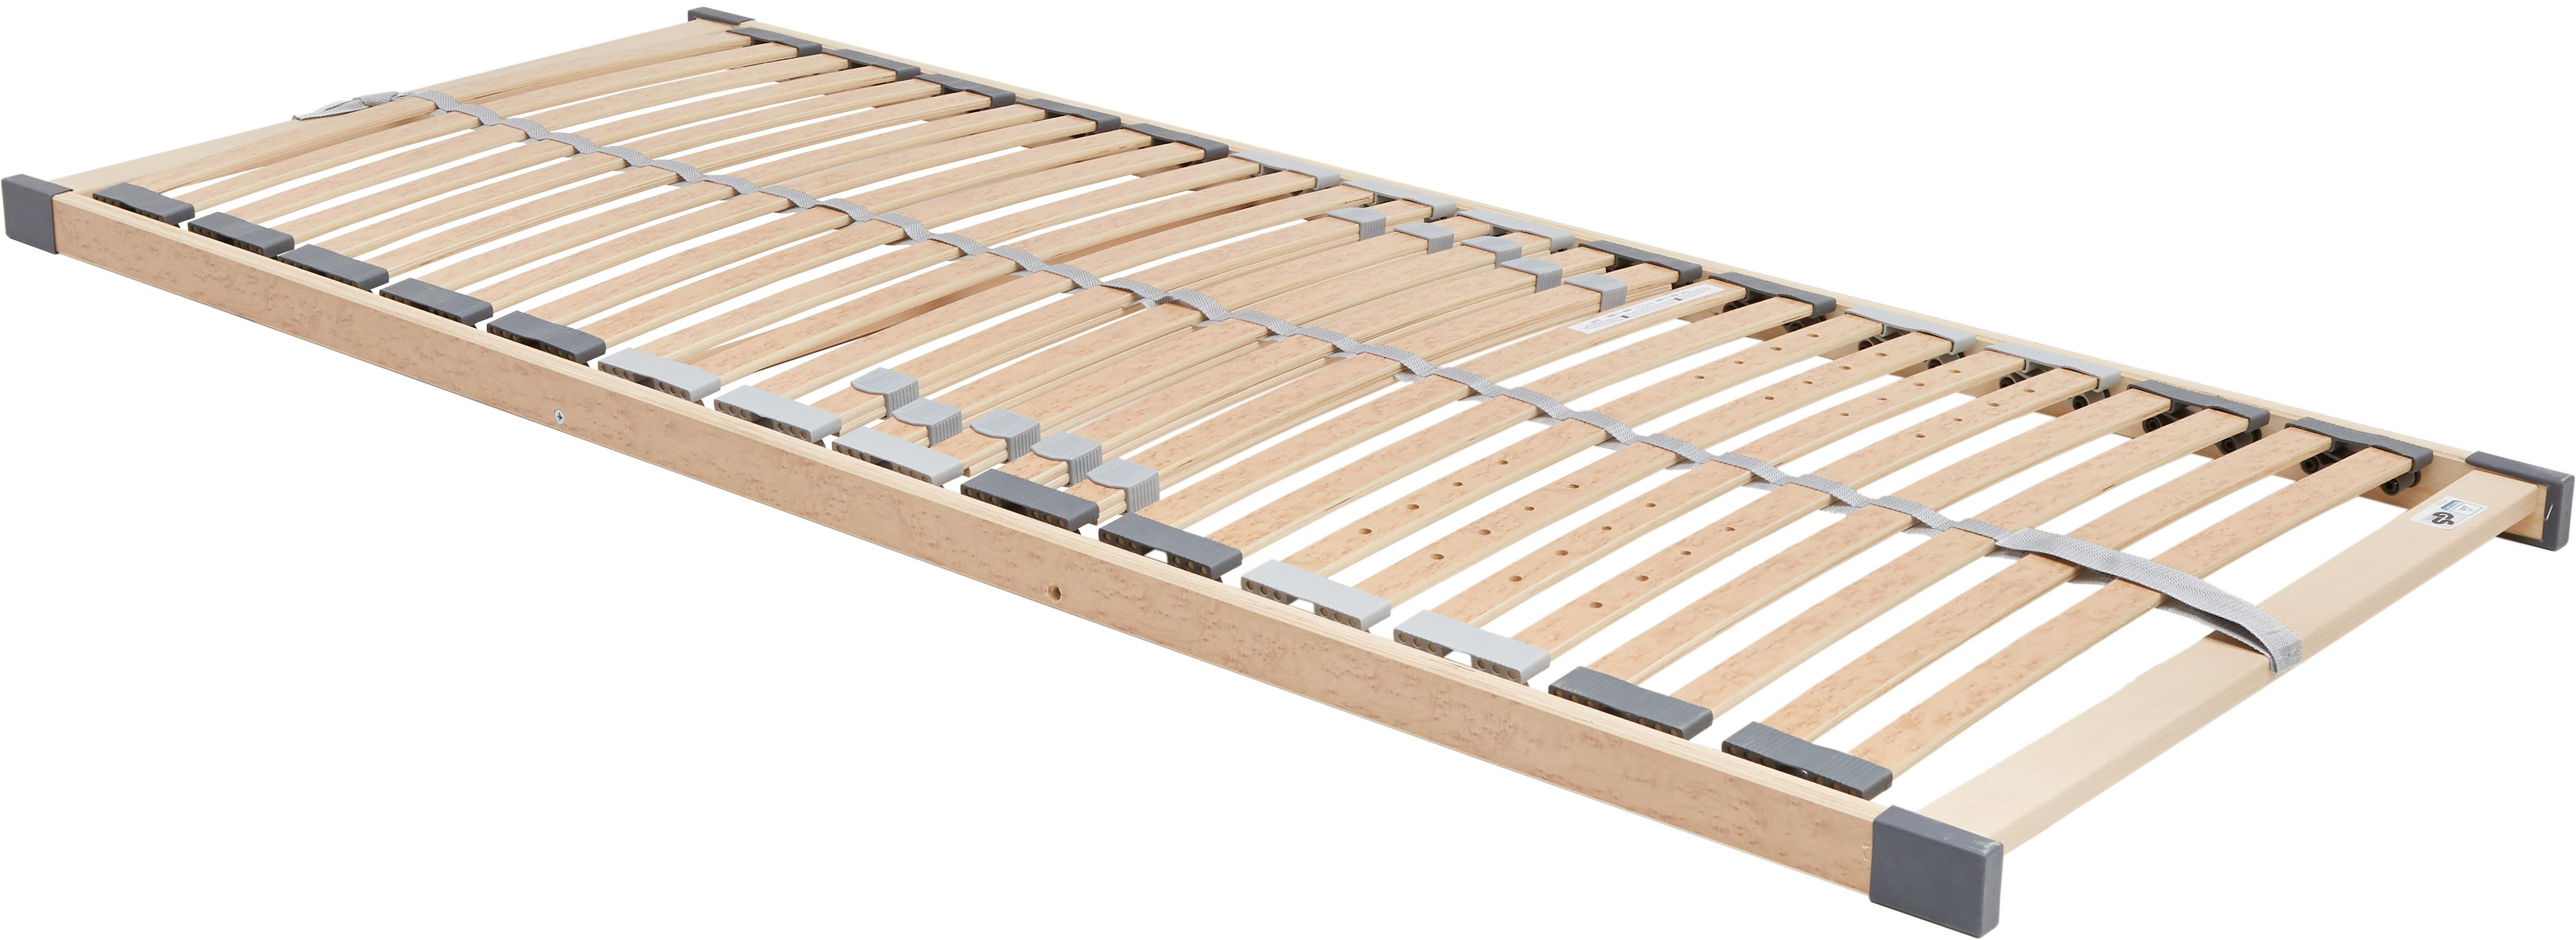 Somier Comfort Plus, Láminas: tablones de madera con de, Pestañas: plástico, Beige, 80 x 200 cm